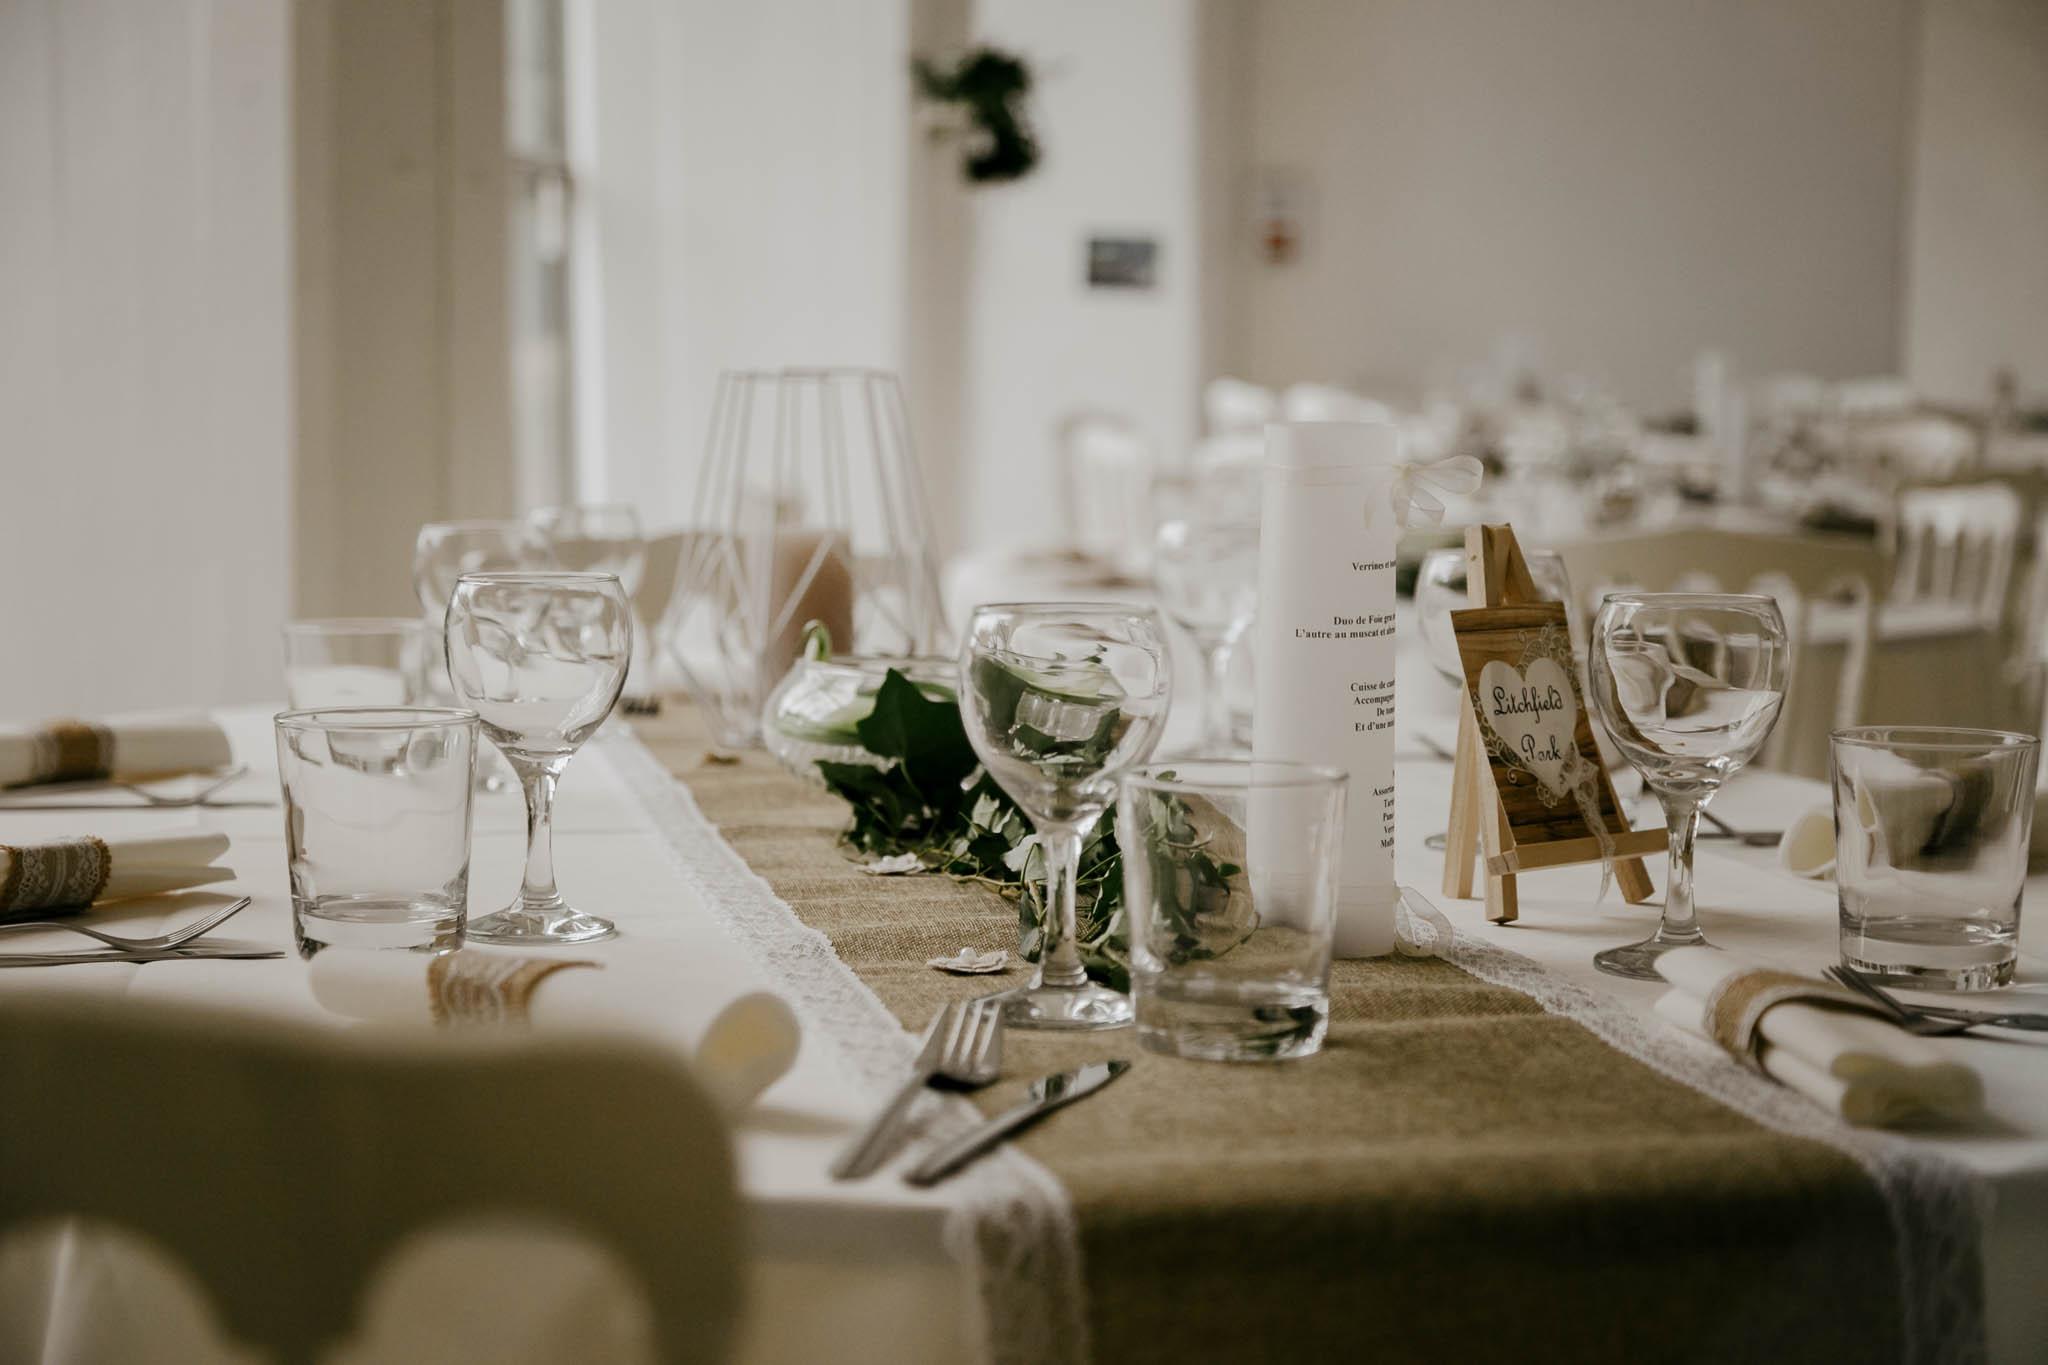 mariage-chateau-gaudras-ingold-77.jpg